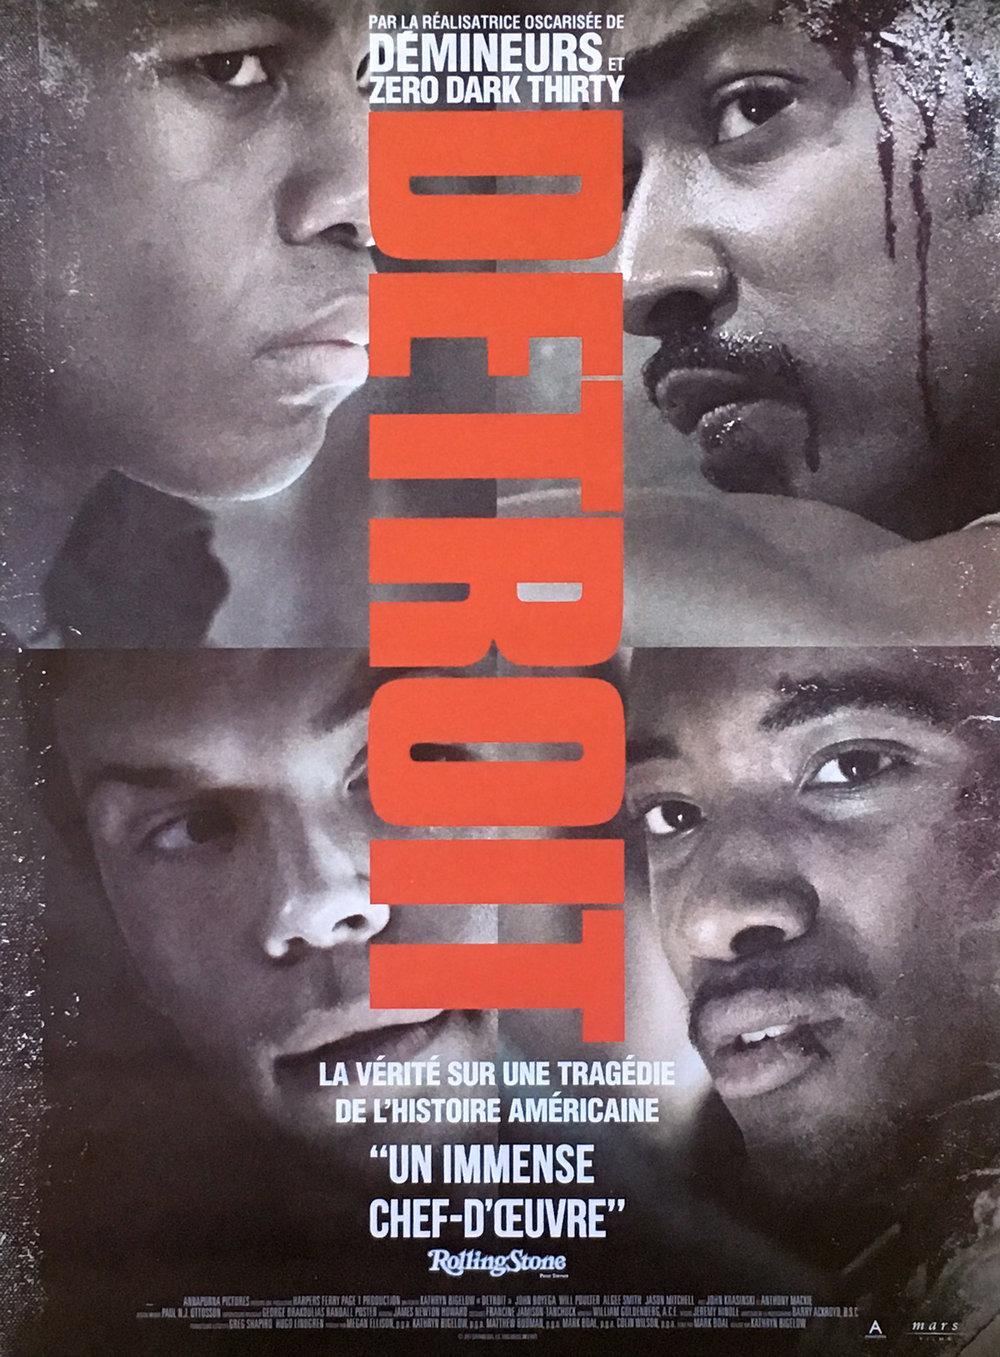 detroit-movie-poster-15x21-in-2017-kathryn-bigelow-john-boyega.jpg